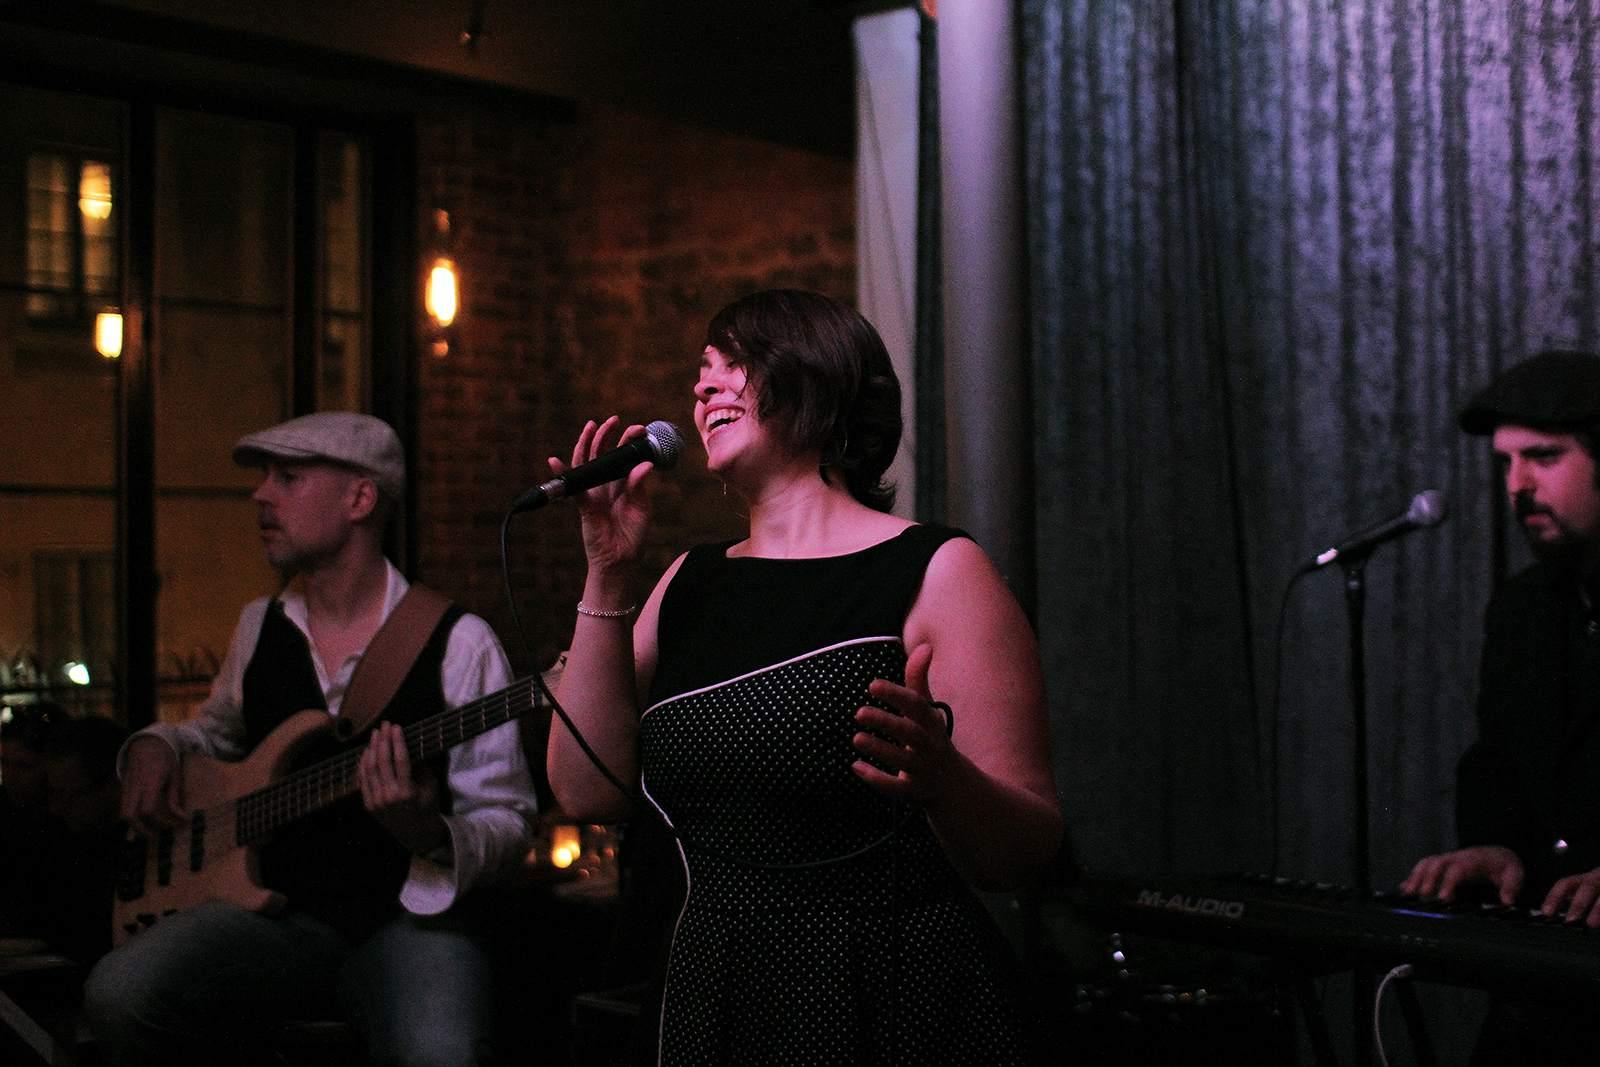 Montreal jazz club performer